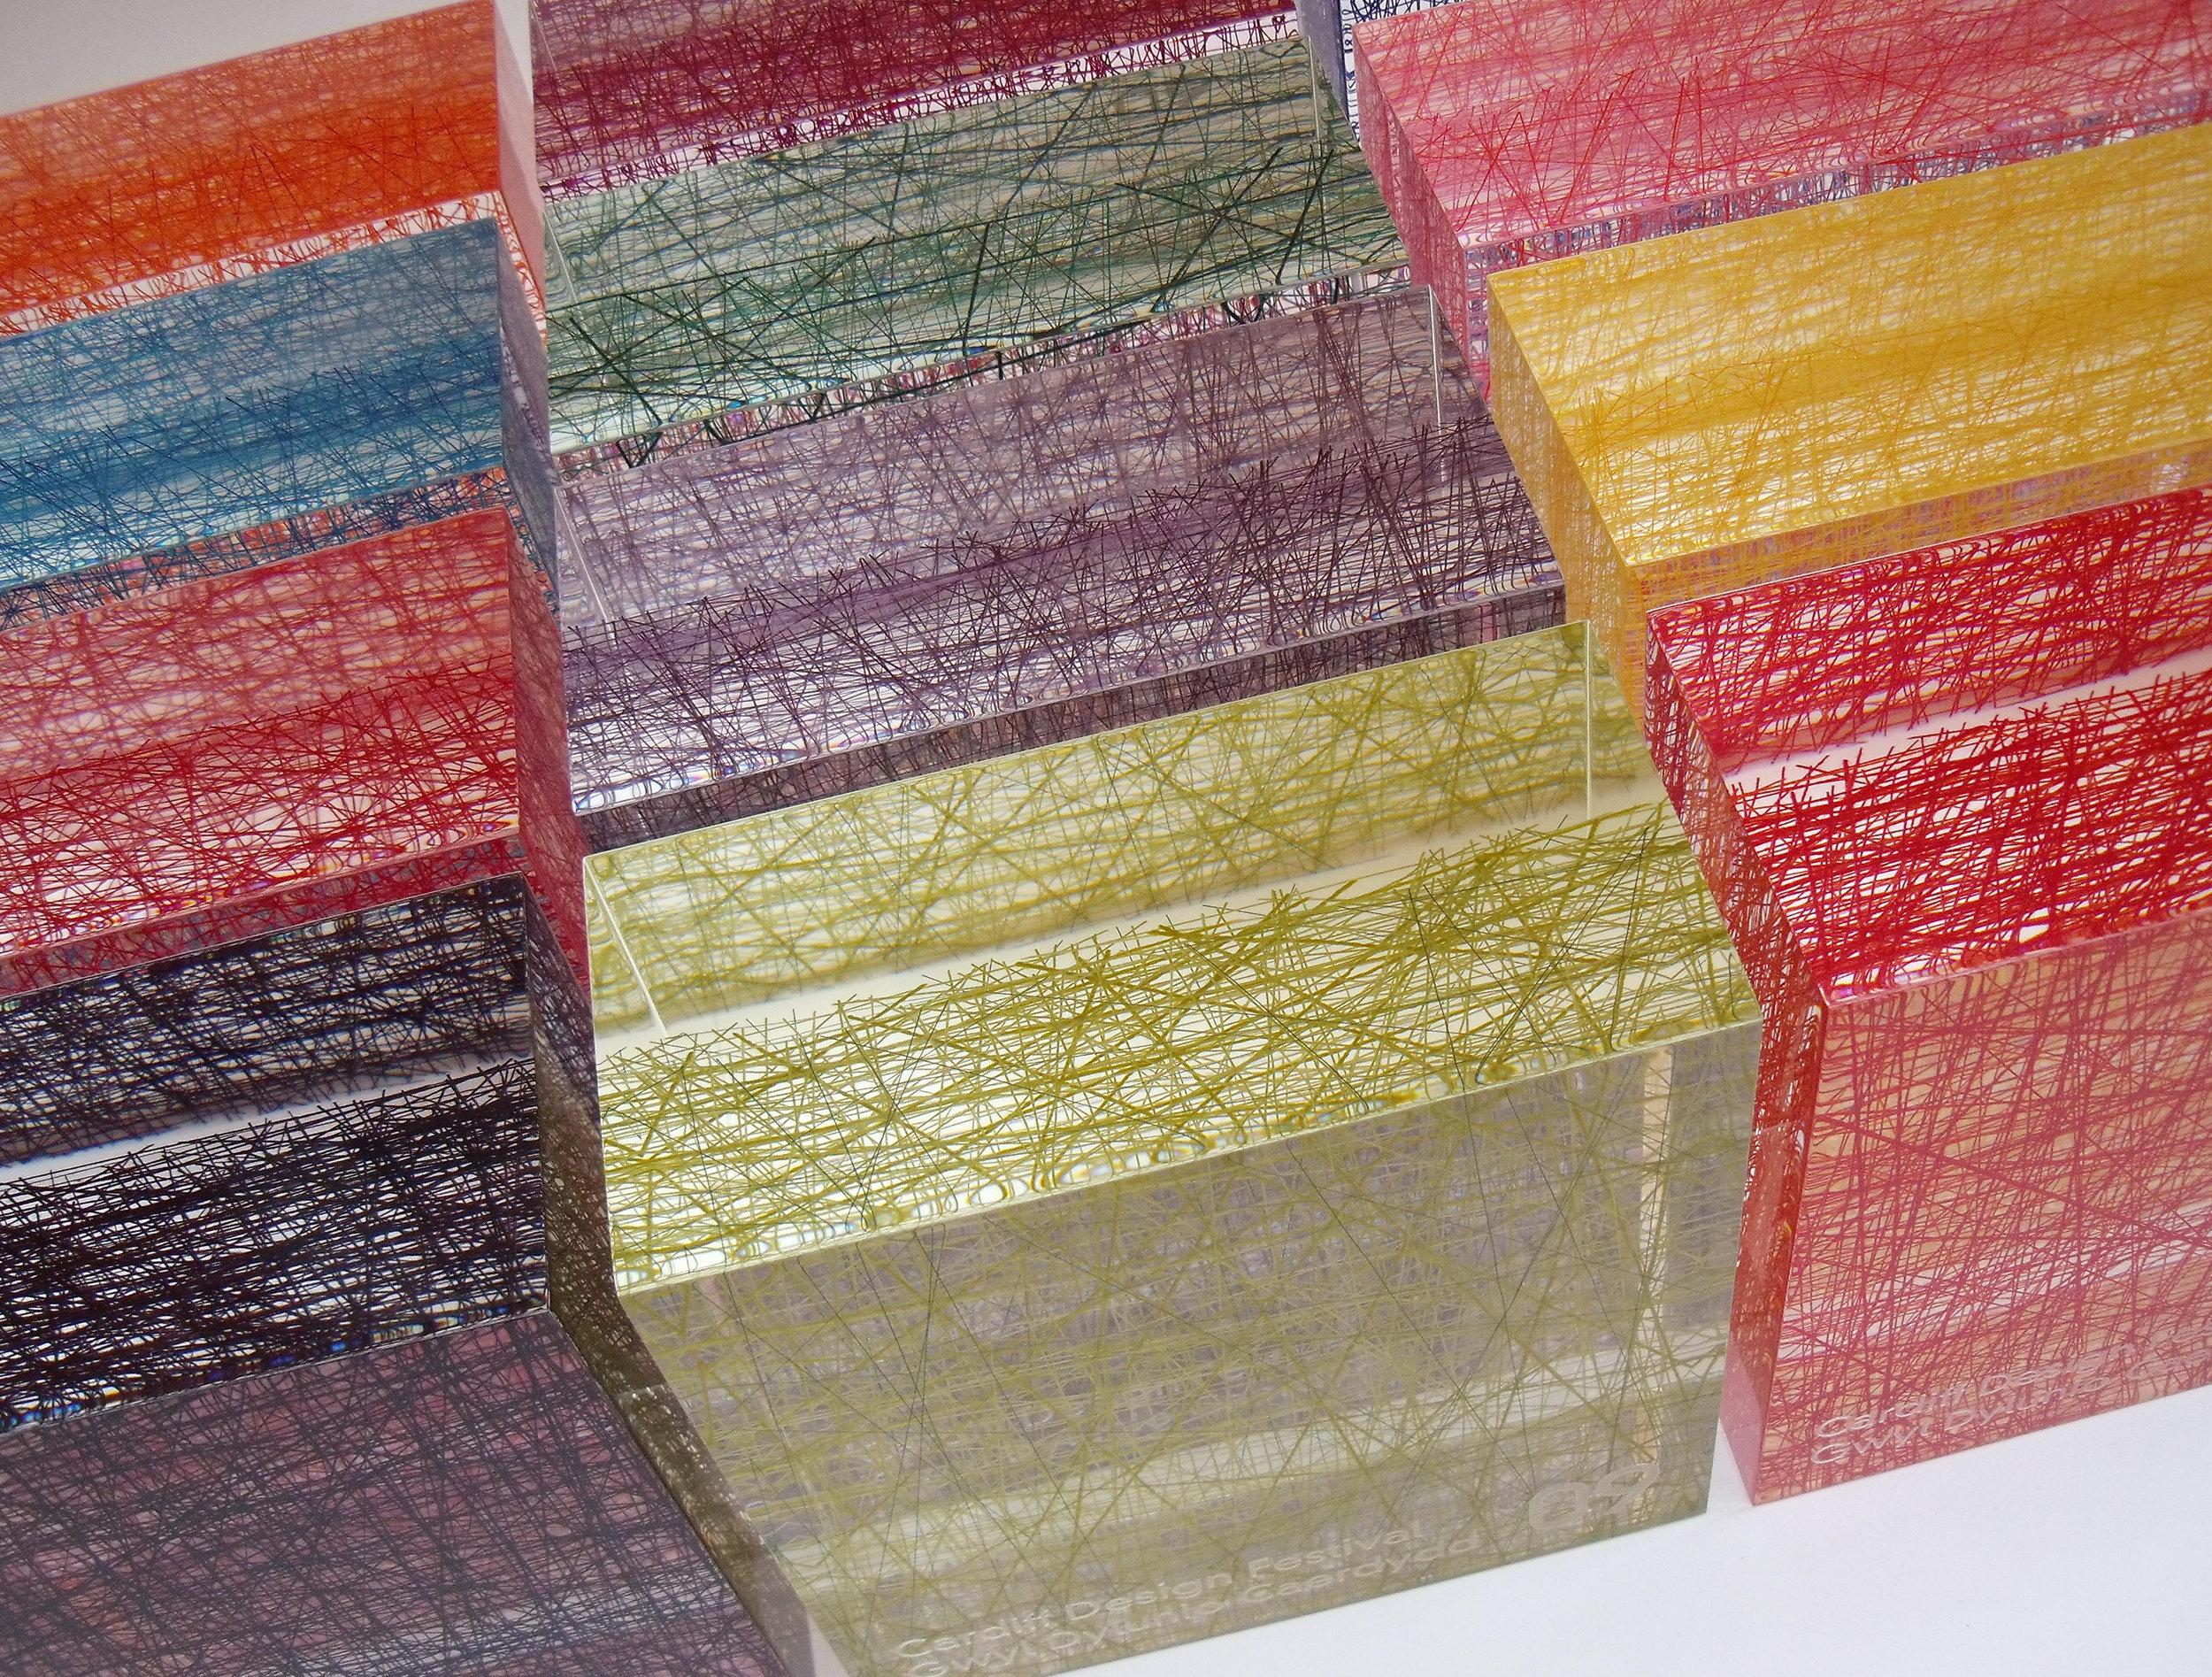 Cardiff Design Festival 2009 awards. Cotton encapsulated in acrylic resin.